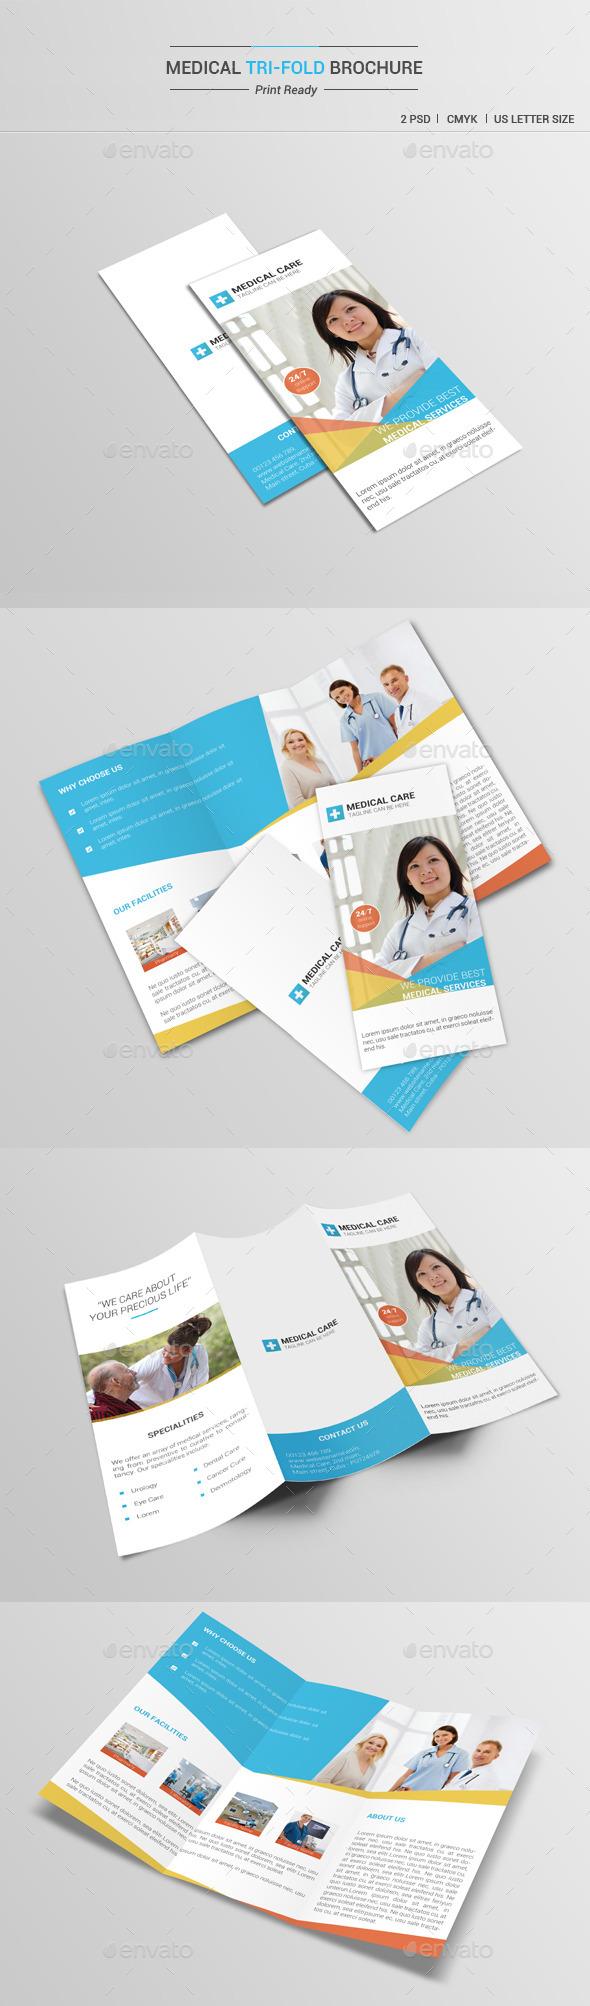 Medical Tri-Fold Brochure V1 - Brochures Print Templates